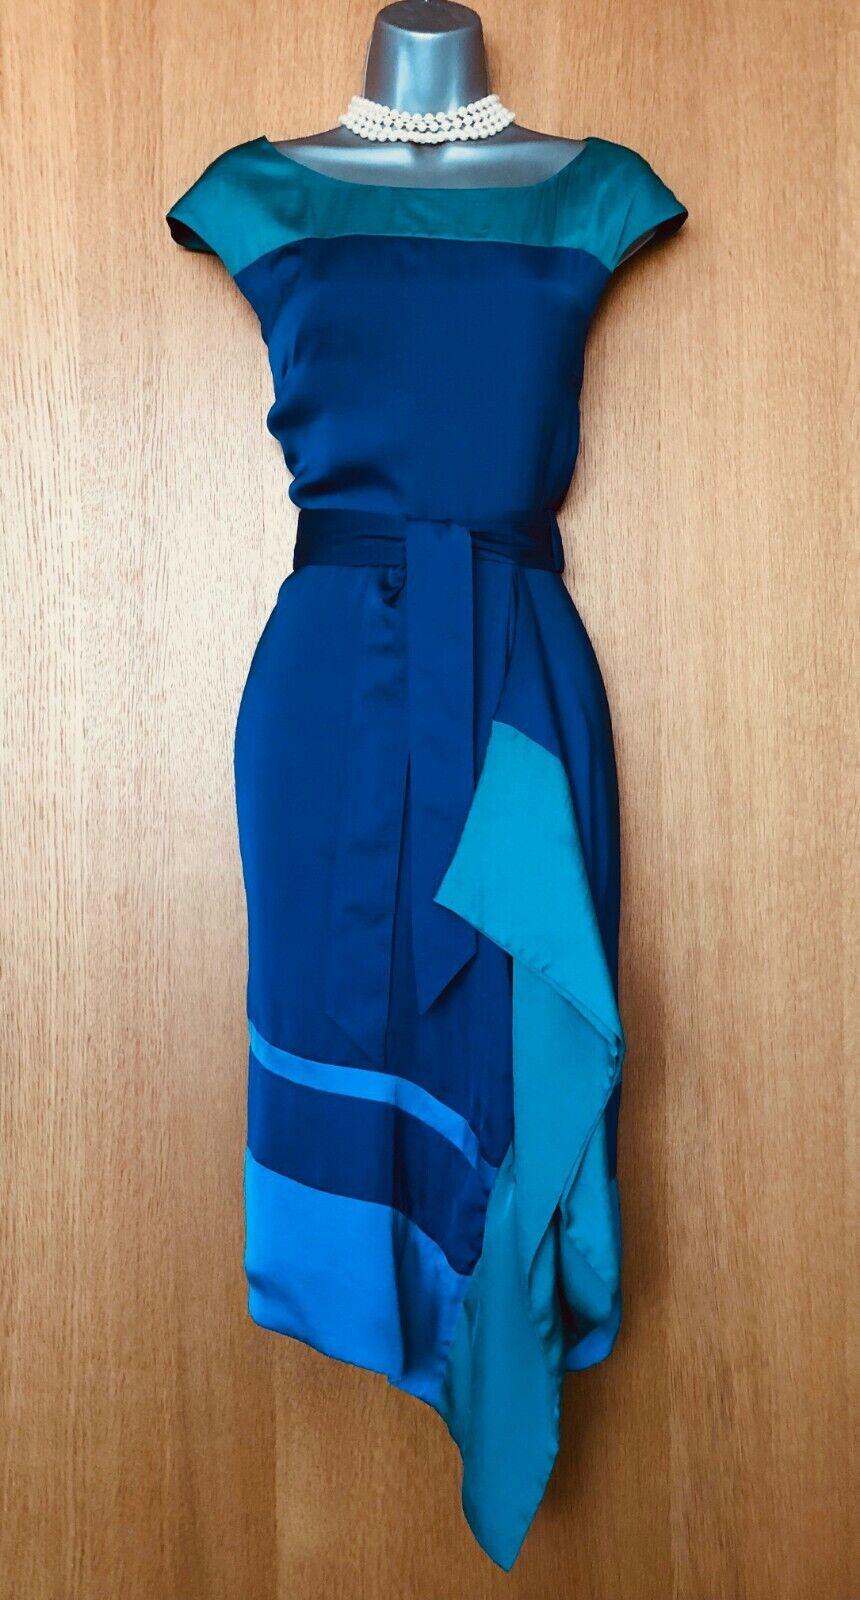 Karen Millen Green bluee Side Detail Belted Shift Formal Casual Dress